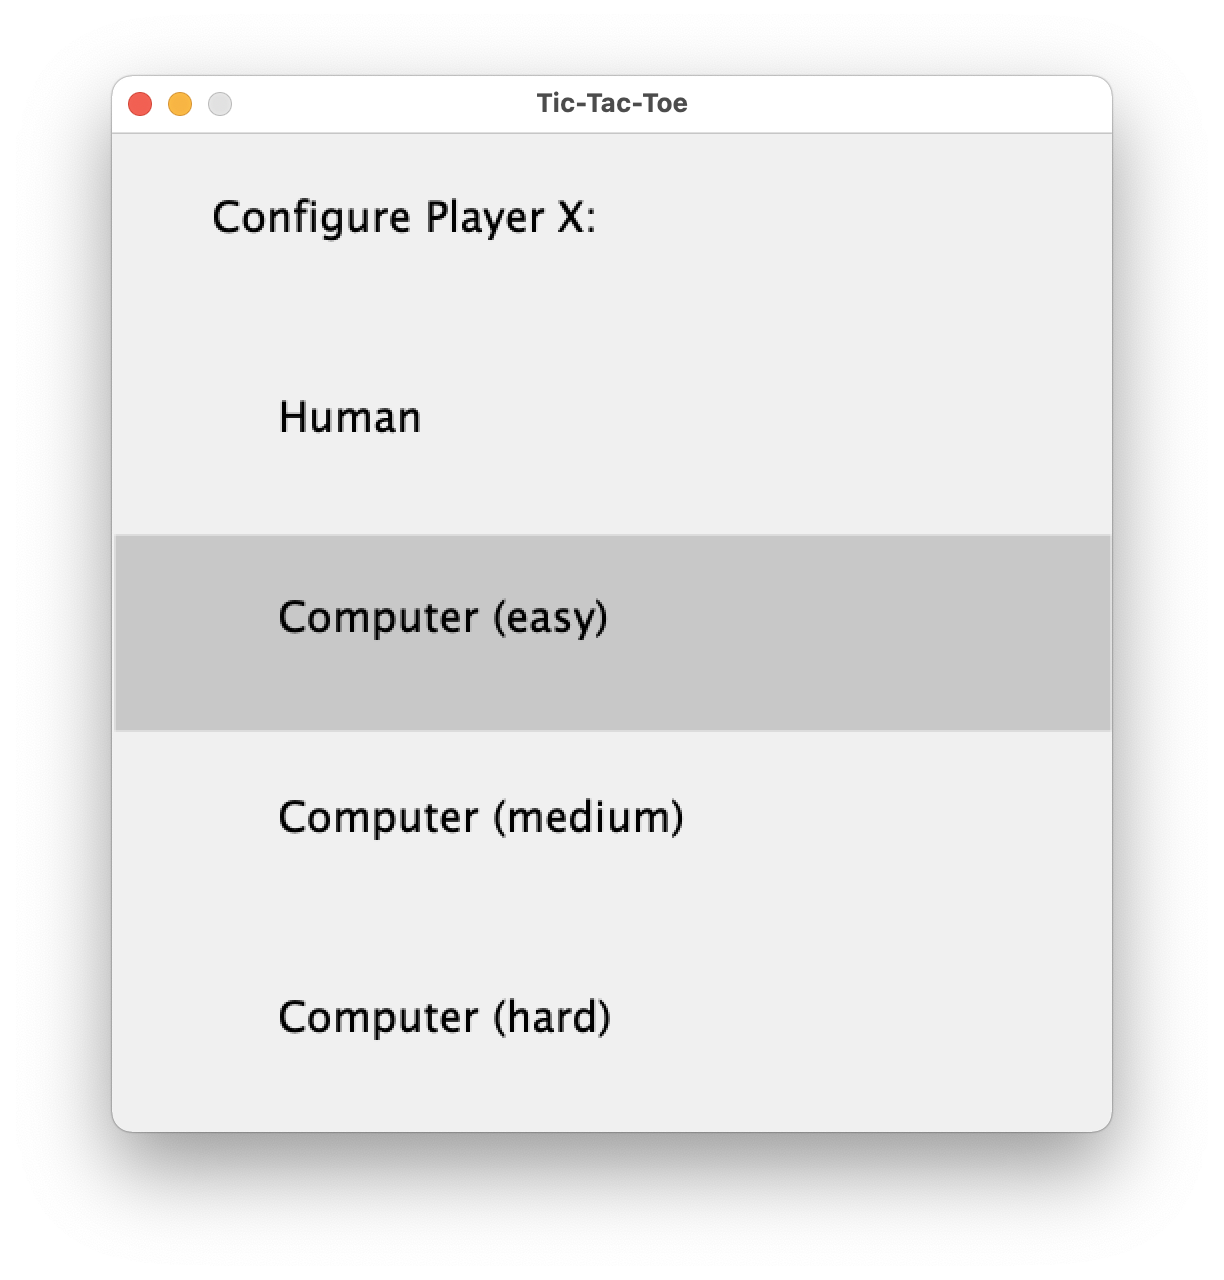 Configure Player X